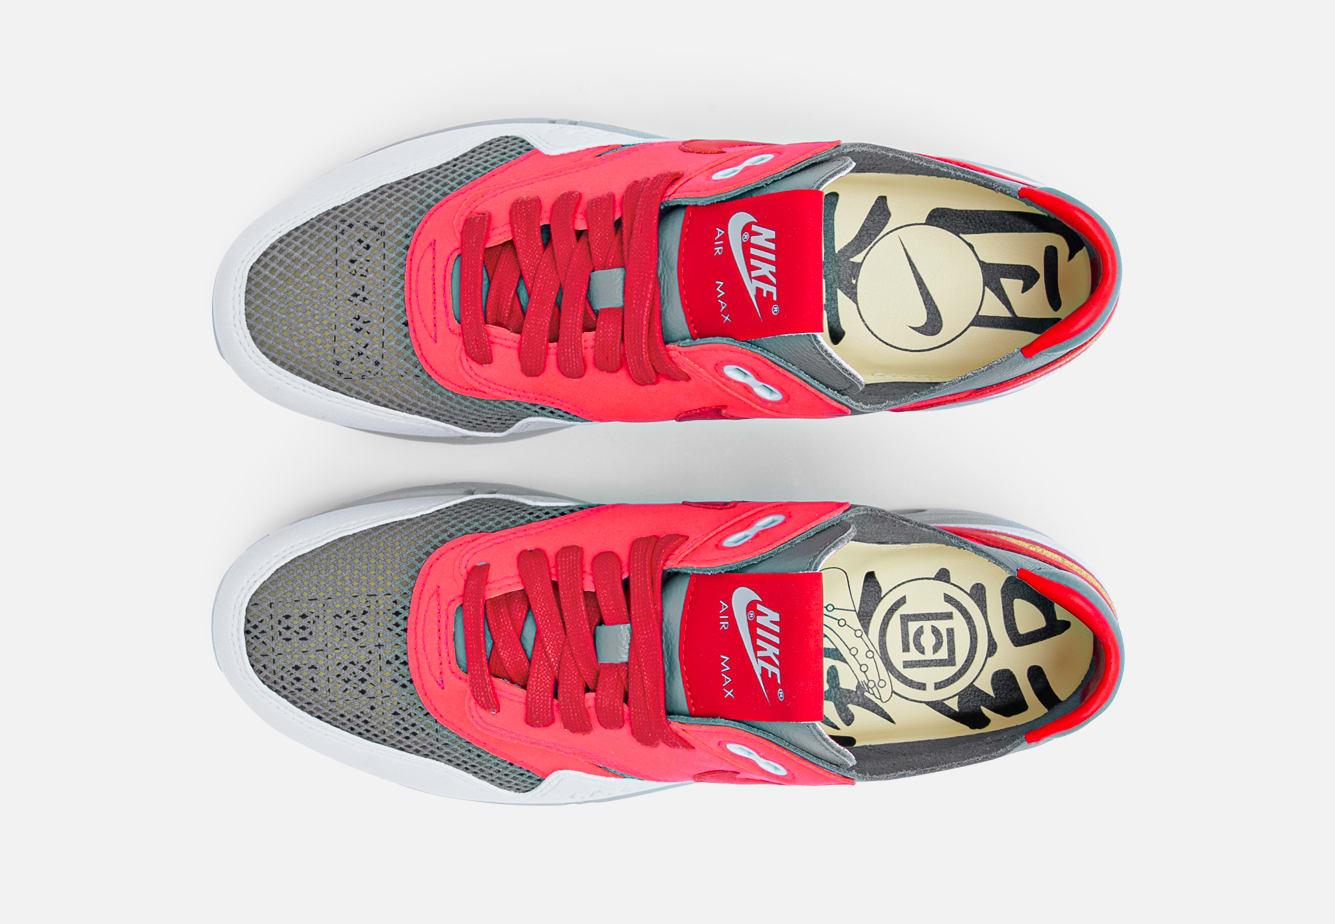 Clot x Nike Air Max 1 'K.O.D.' -Solar Red Top